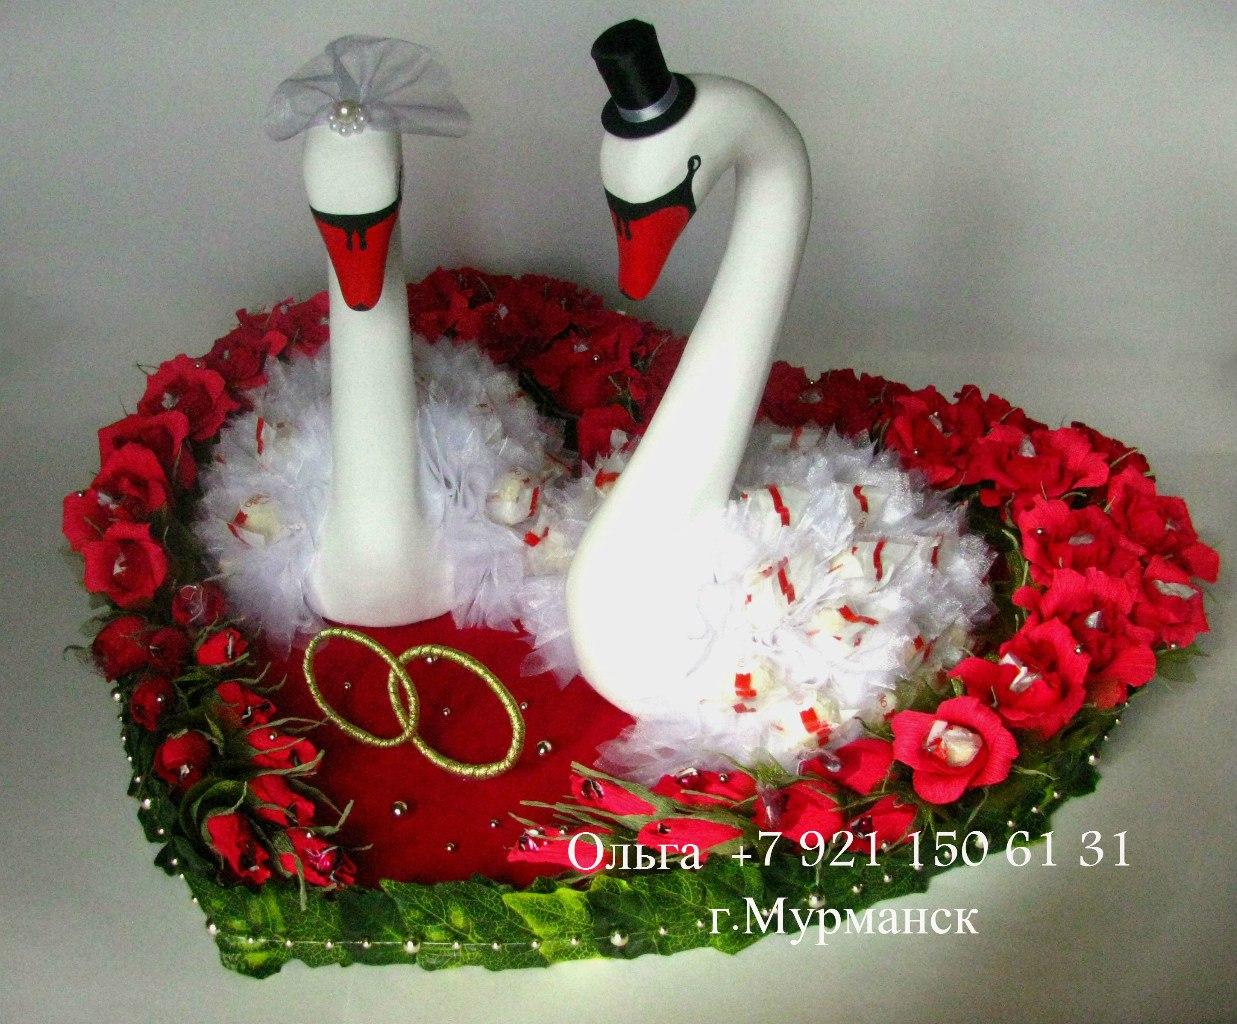 Лебедь на свадьбу